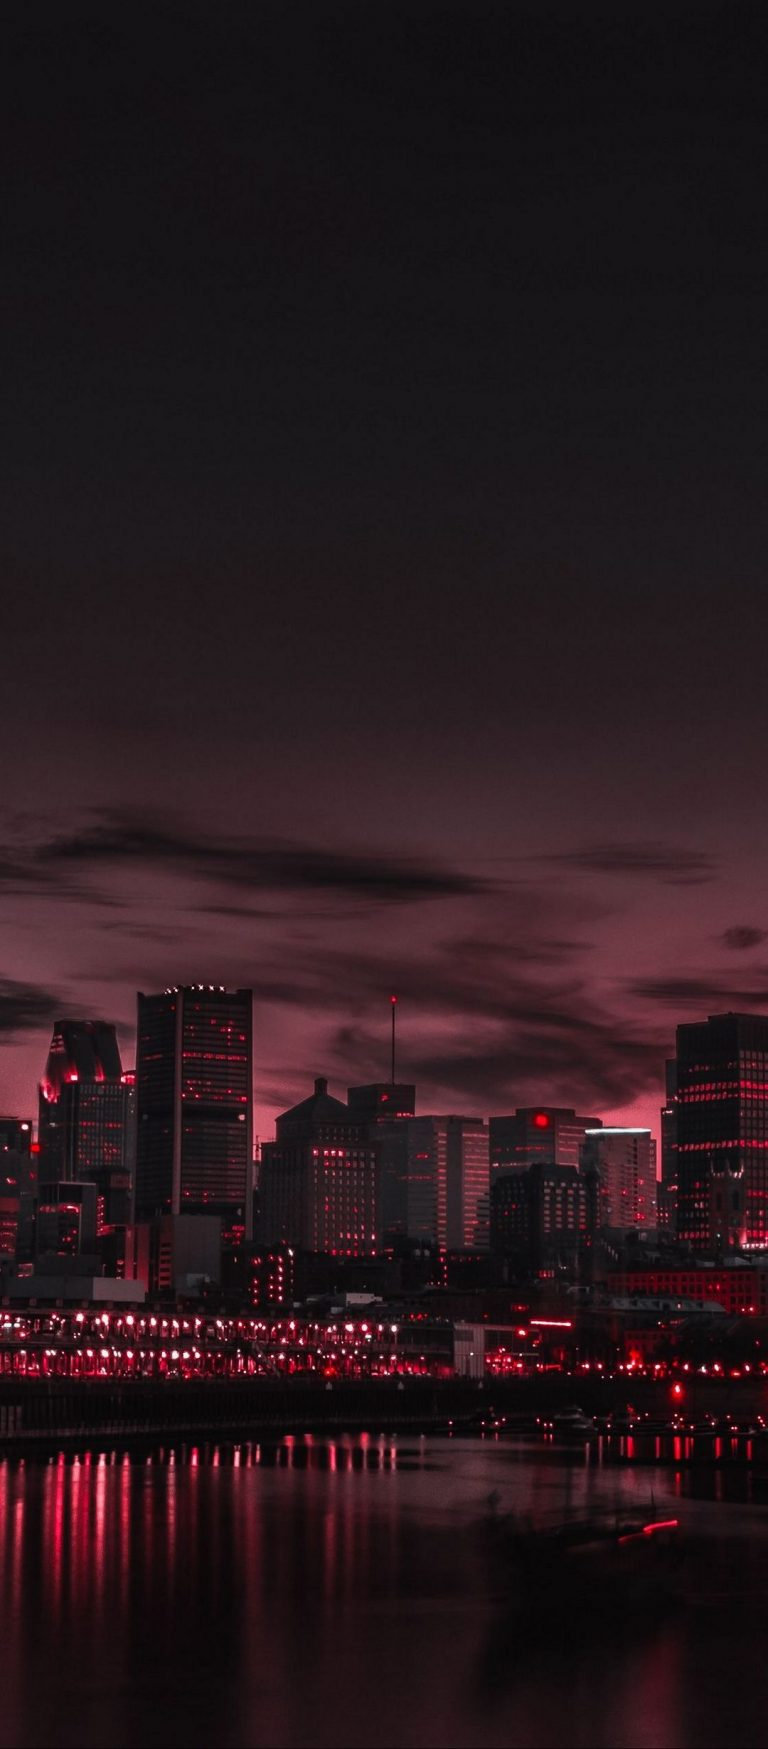 City Night Panorama 1080x2460 768x1749